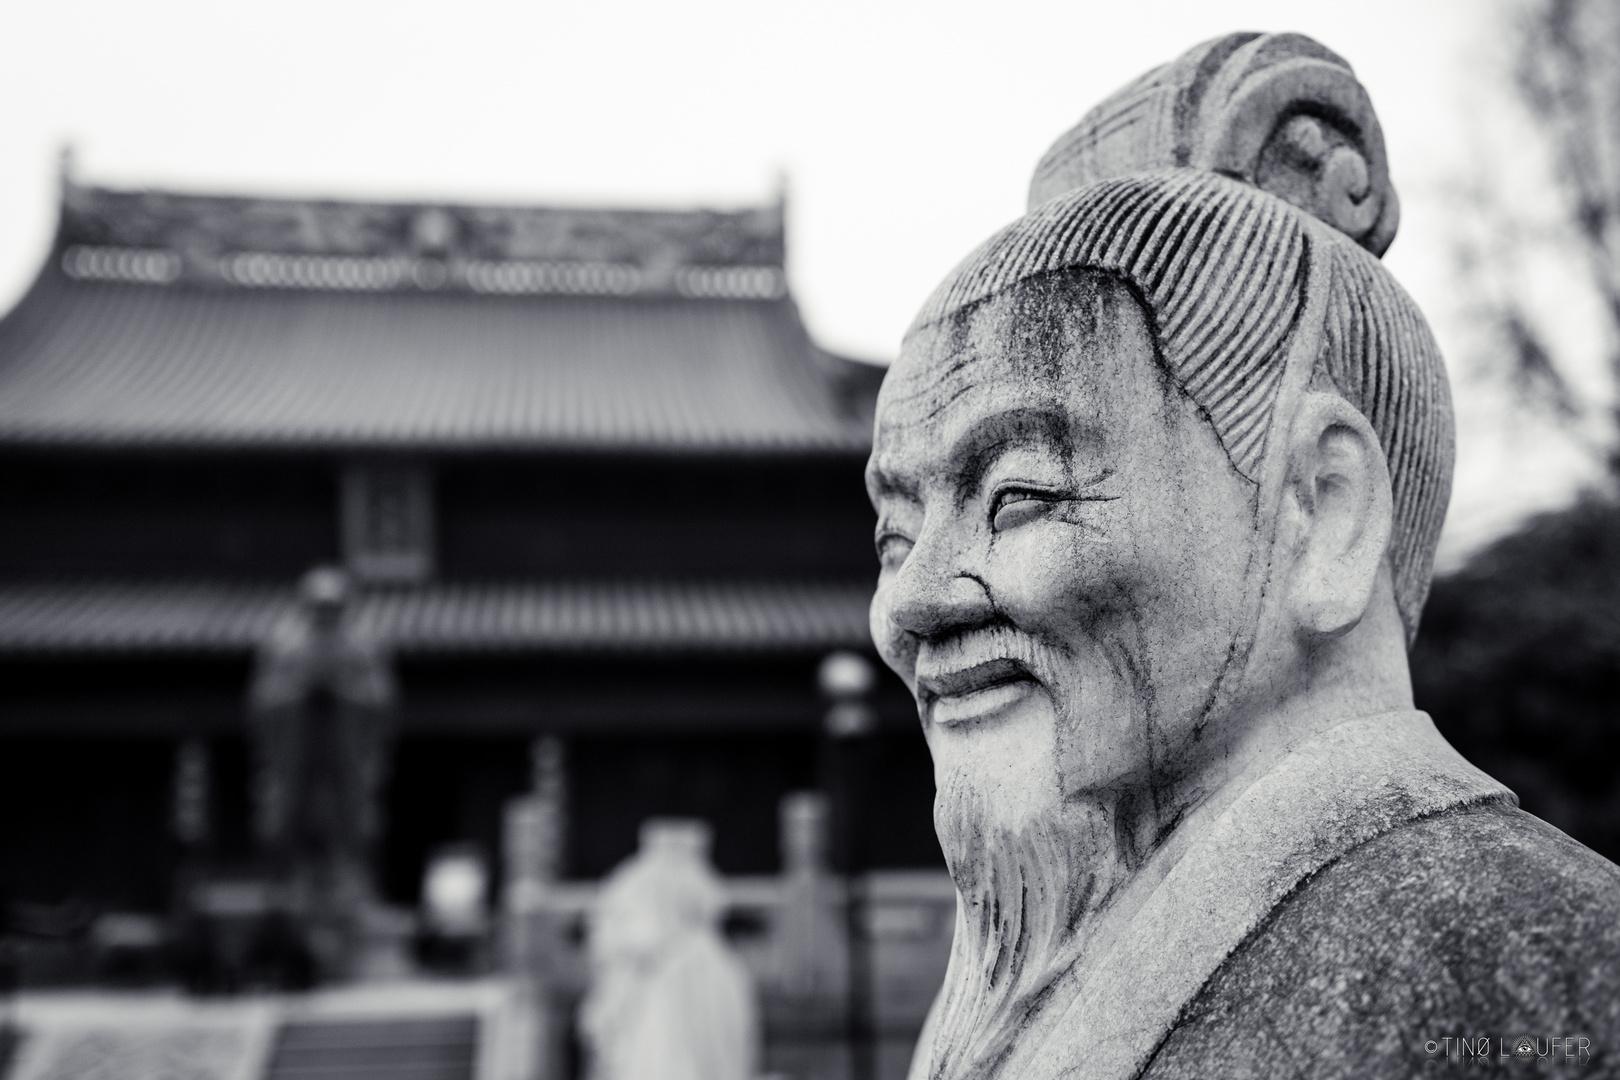 Confucius Temple in Nanjing, China